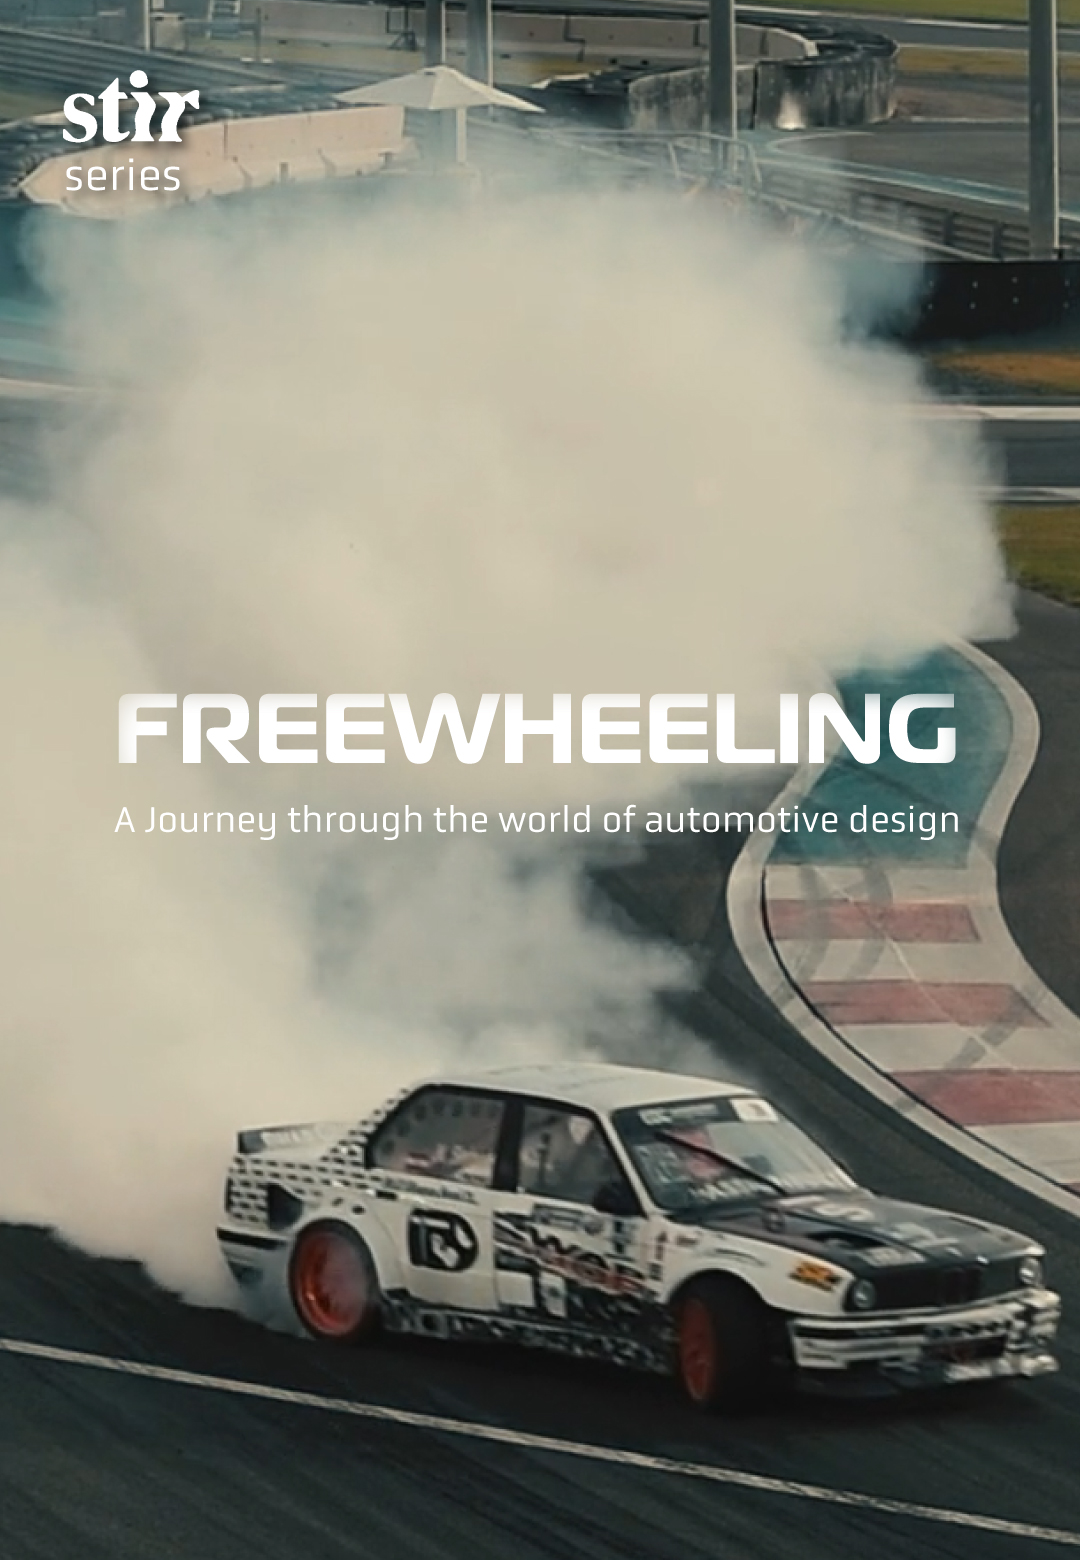 Freewheeling: A STIRring journey through the world of automotive design | Freewheeling: A STIRring journey through the world of automotive design | STIRworld